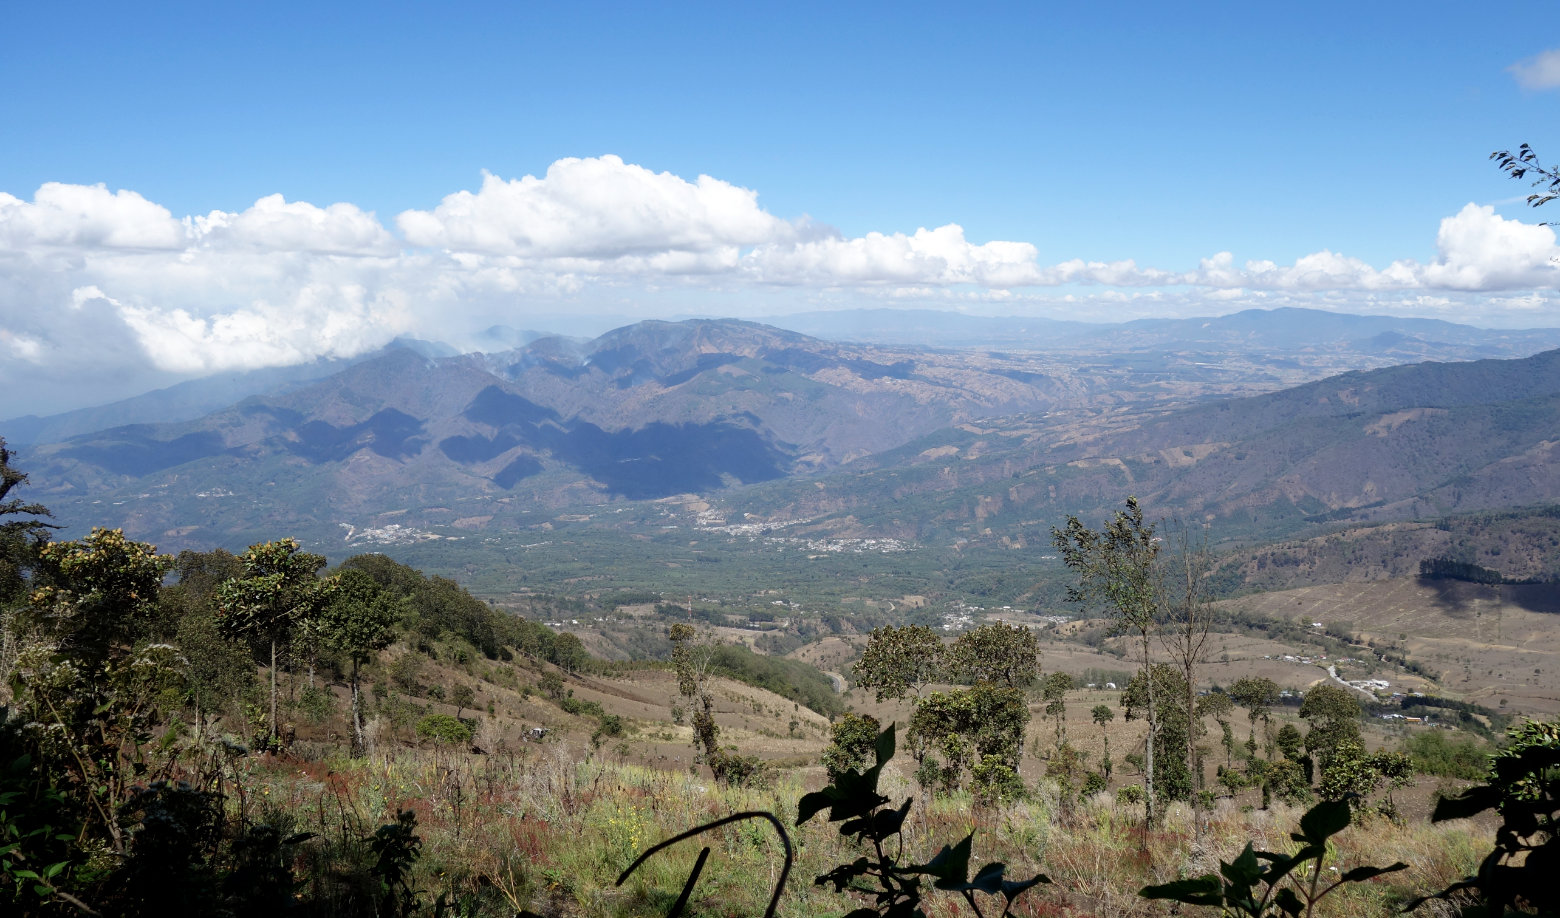 Guatemala Antigua Wanderung Blick auf die Felder